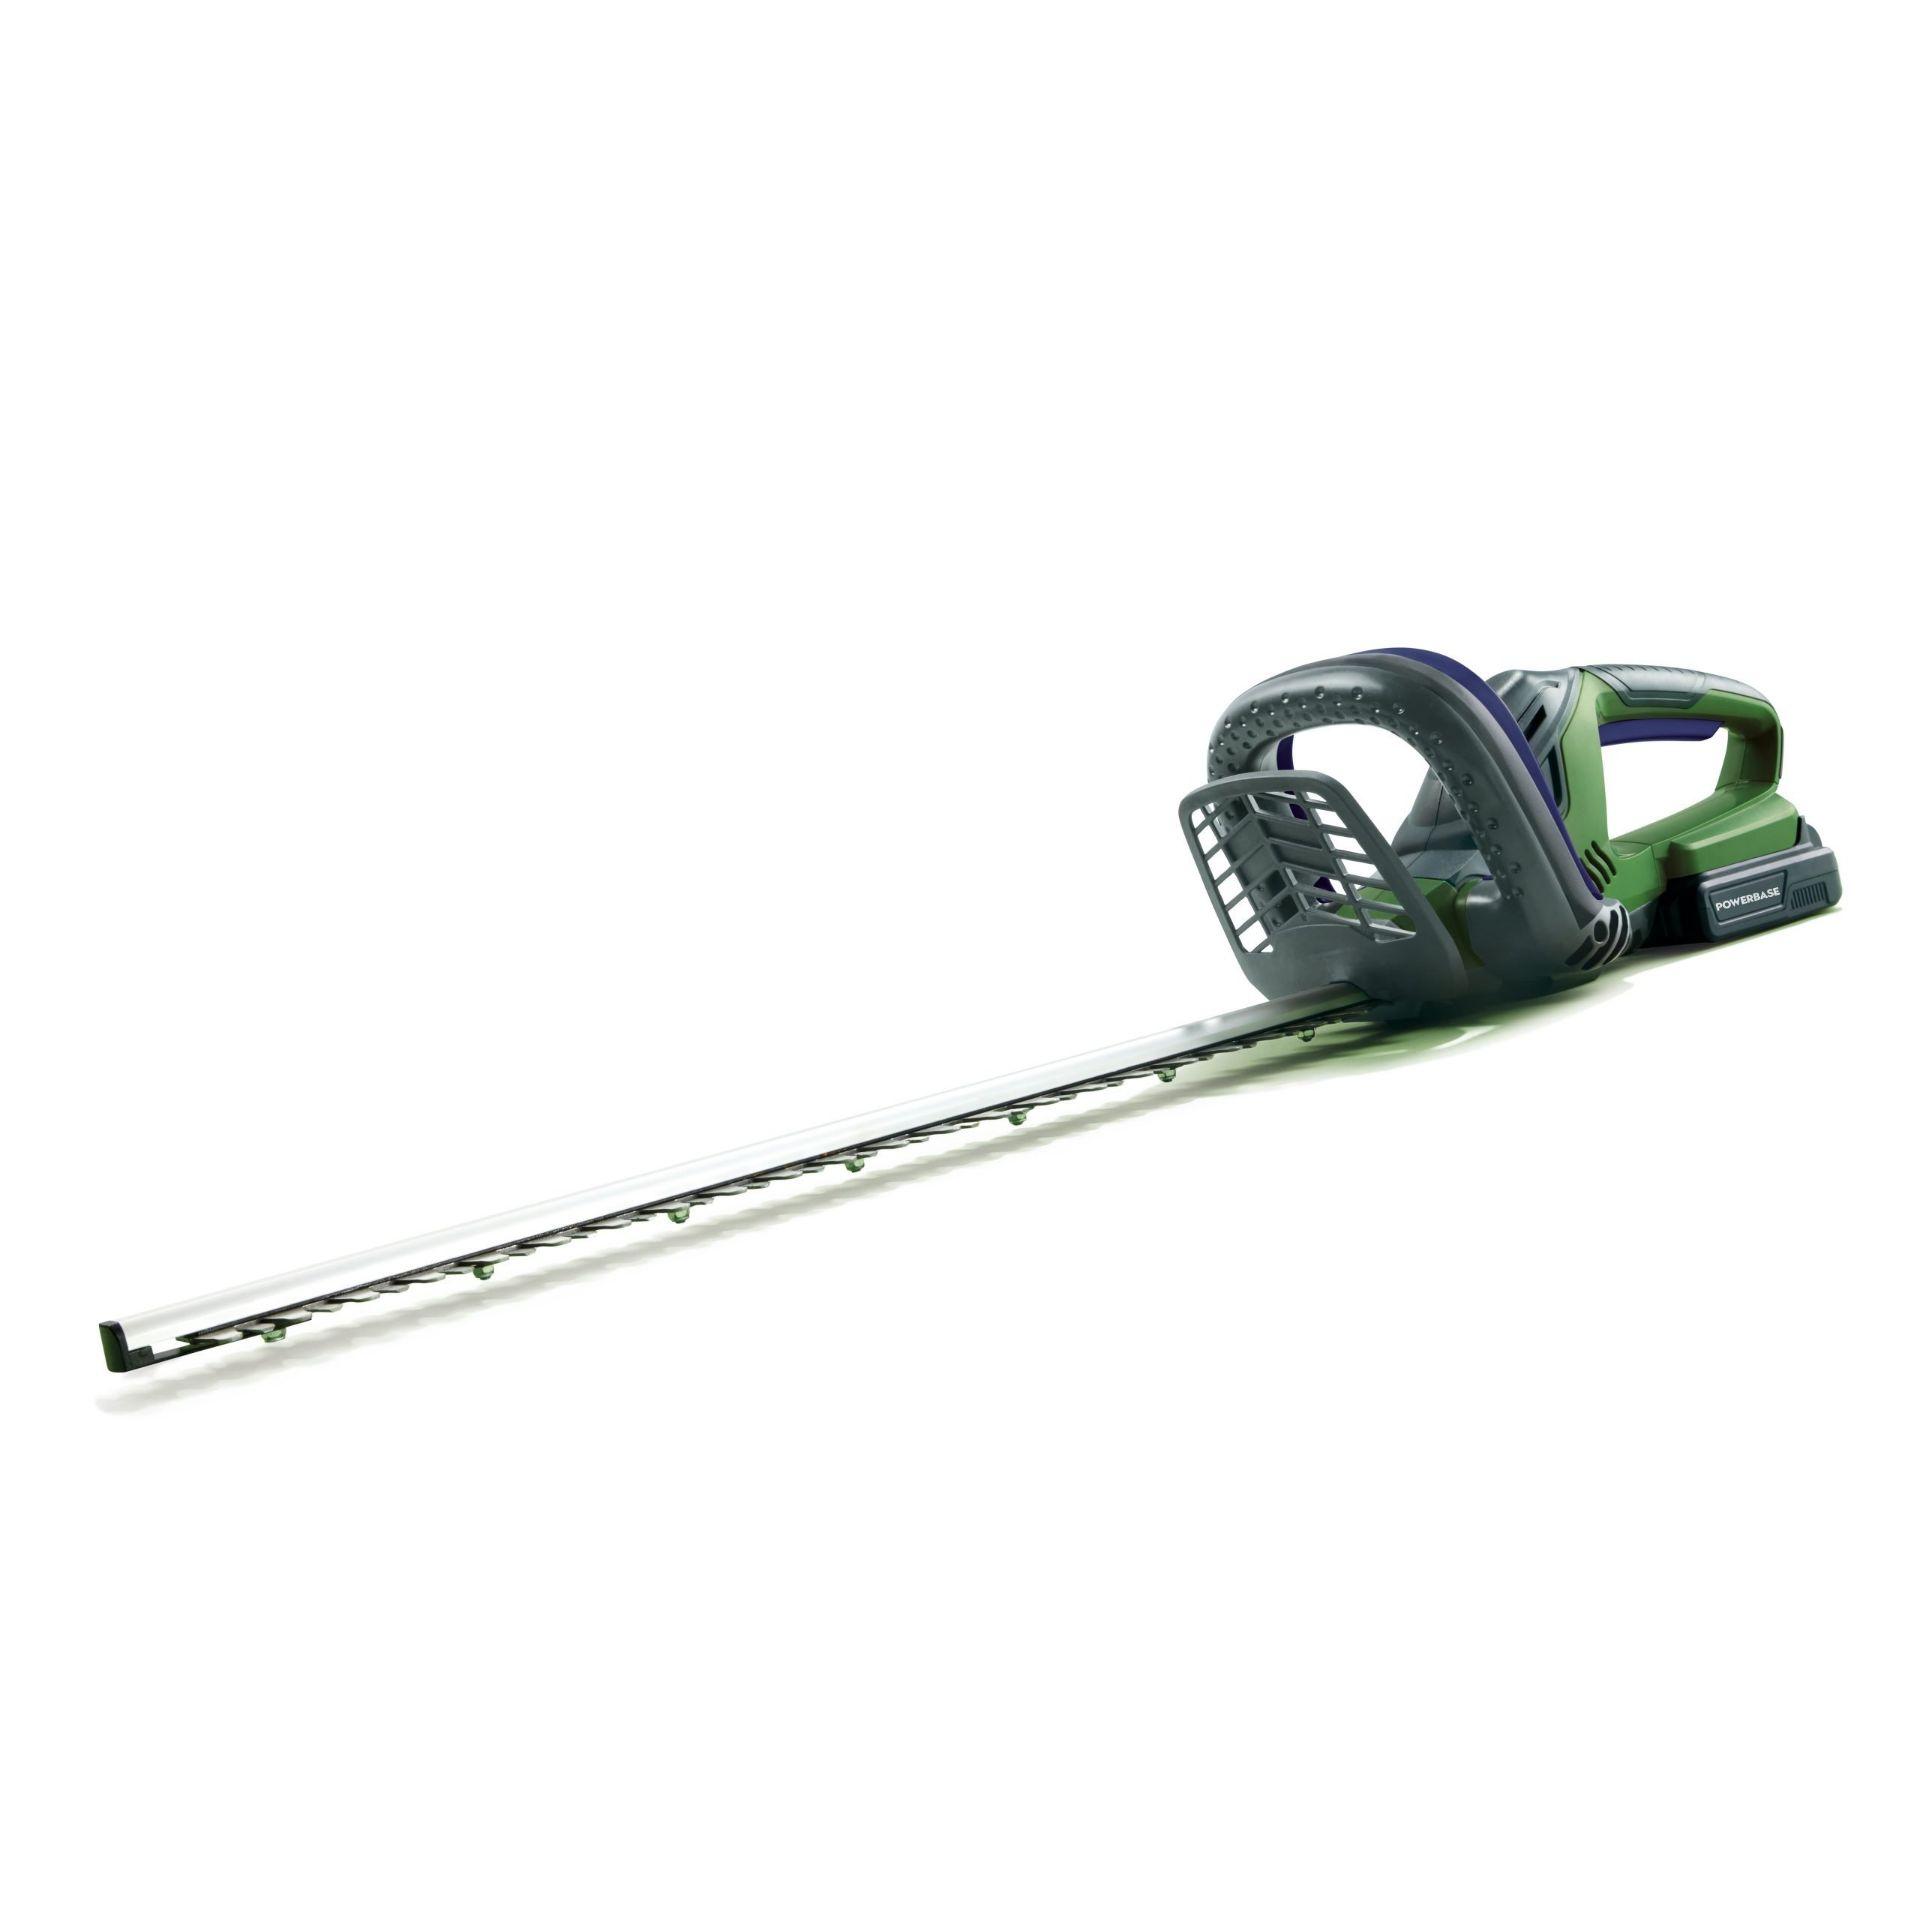 (P9) 2x Items. 1x Qualcast 25.4cc Petrol Grass Trimmer 38cm RRP £110. 1x Powerbase 51cm 20V Cordles - Image 2 of 4